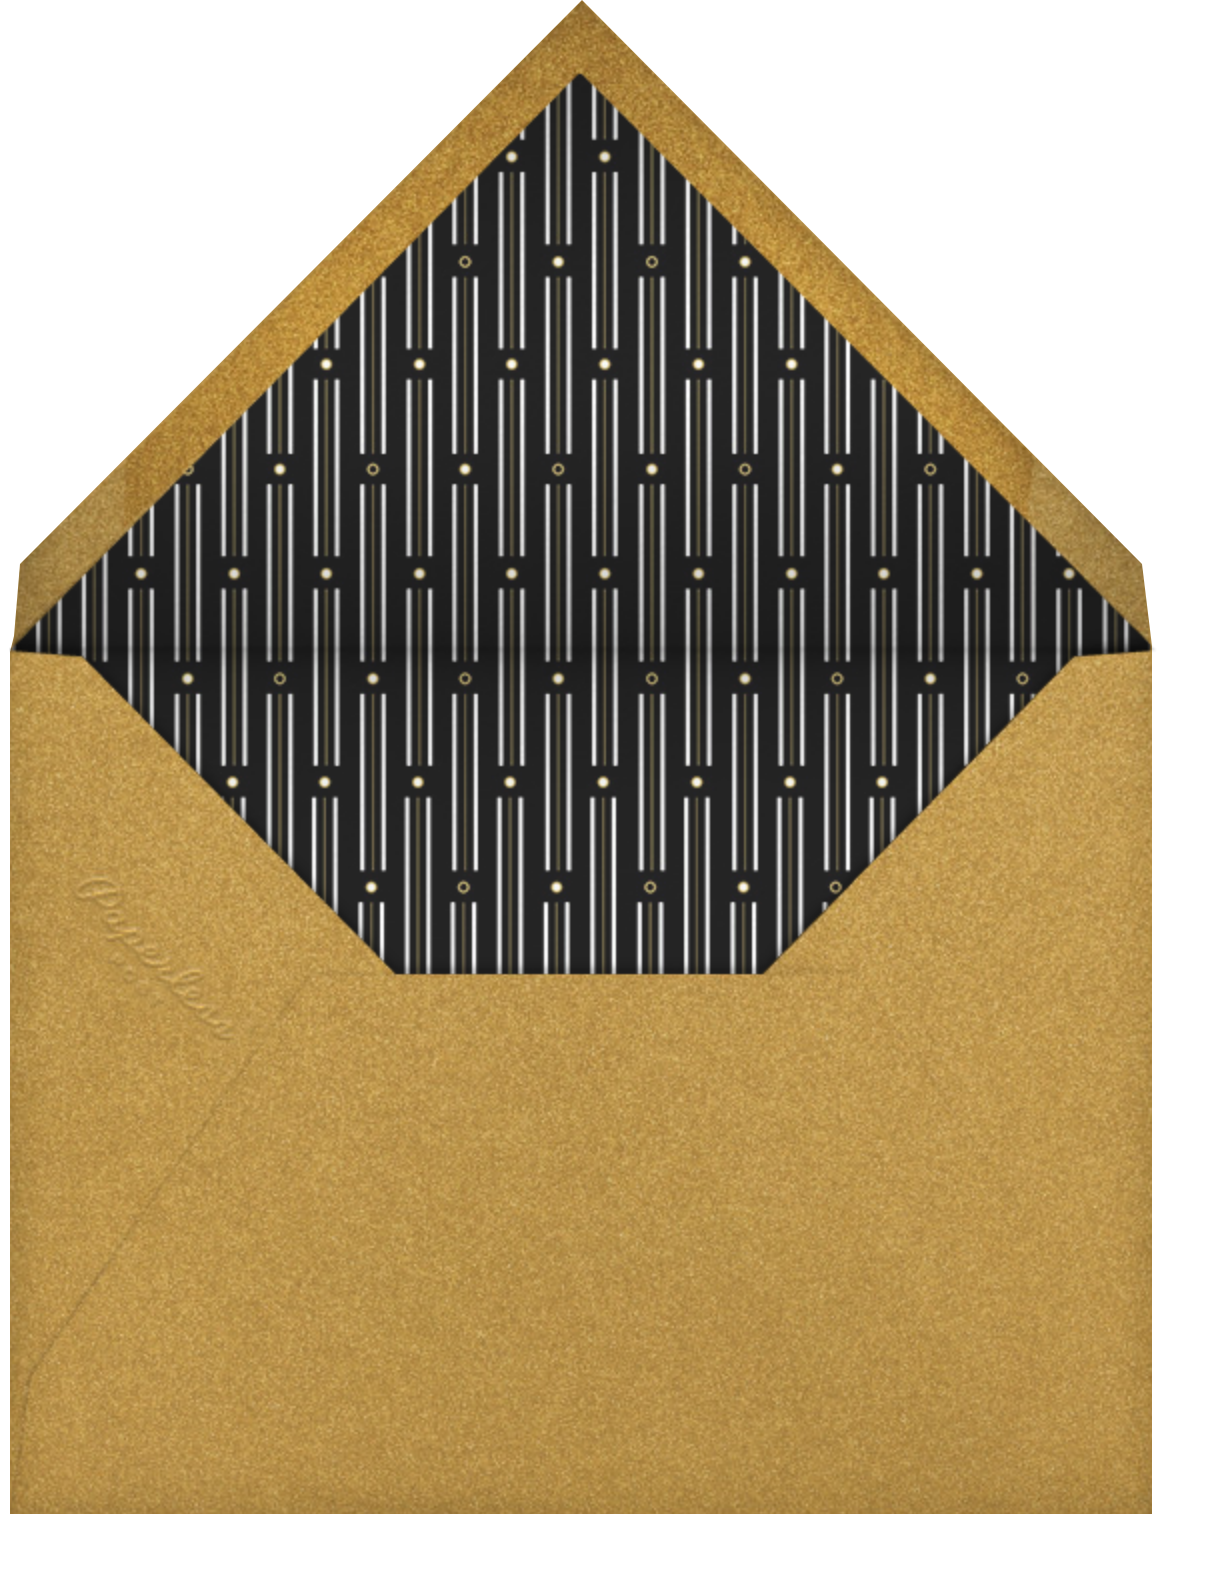 Pall Mall - Paperless Post - Graduation - envelope back